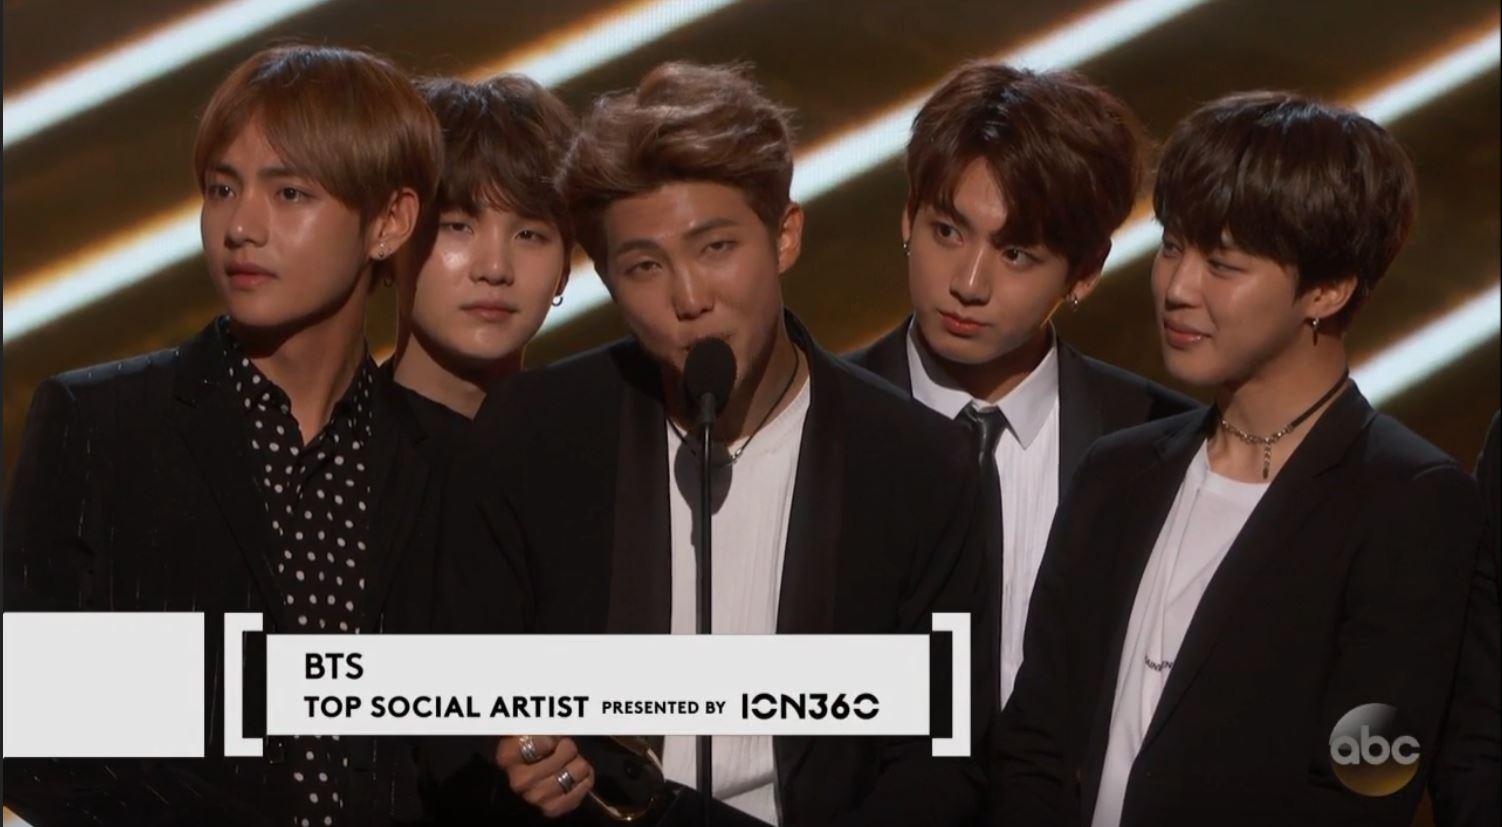 Bts Won The Top Social Media Artist Award At The  Billboard Music Awards Breaking Justin Biebers  Year Streak For The Award